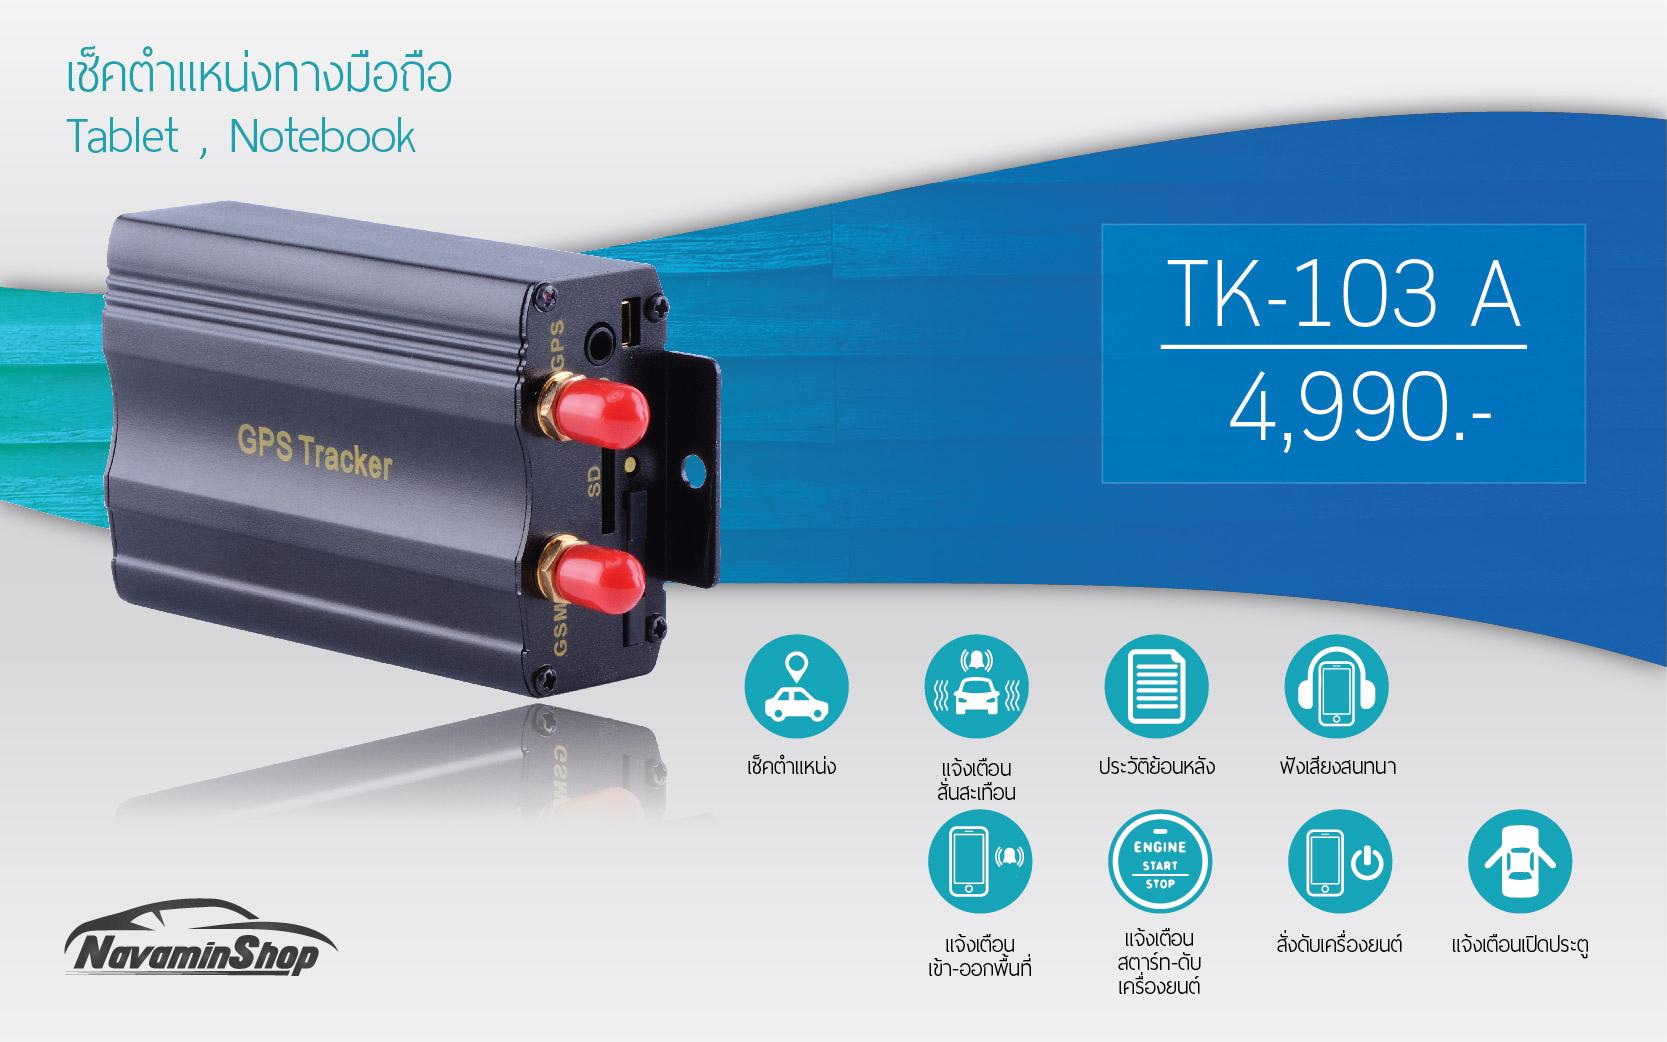 gps tracker ราคา, gps tracker ราคาถูก, ขาย gps tracker, ติดตั้ง gps tracker, gps tracker,gps tracker tk103,,gps tracker tk103a